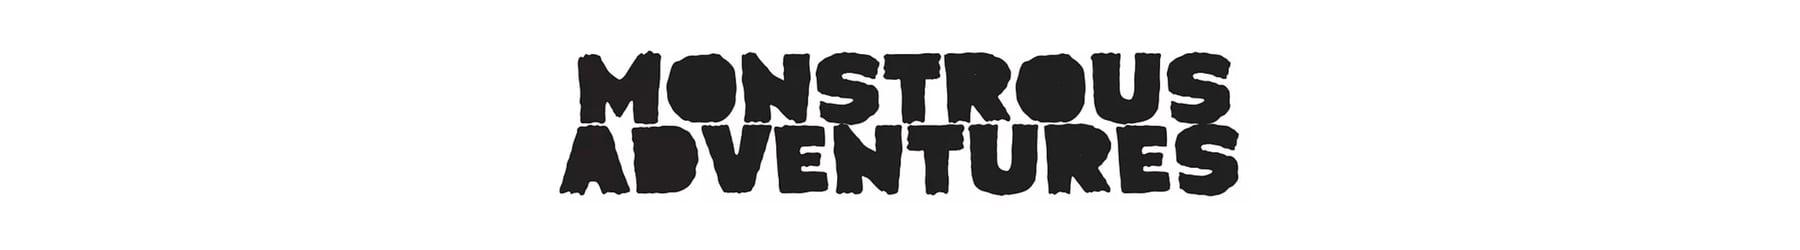 monstrousadventures